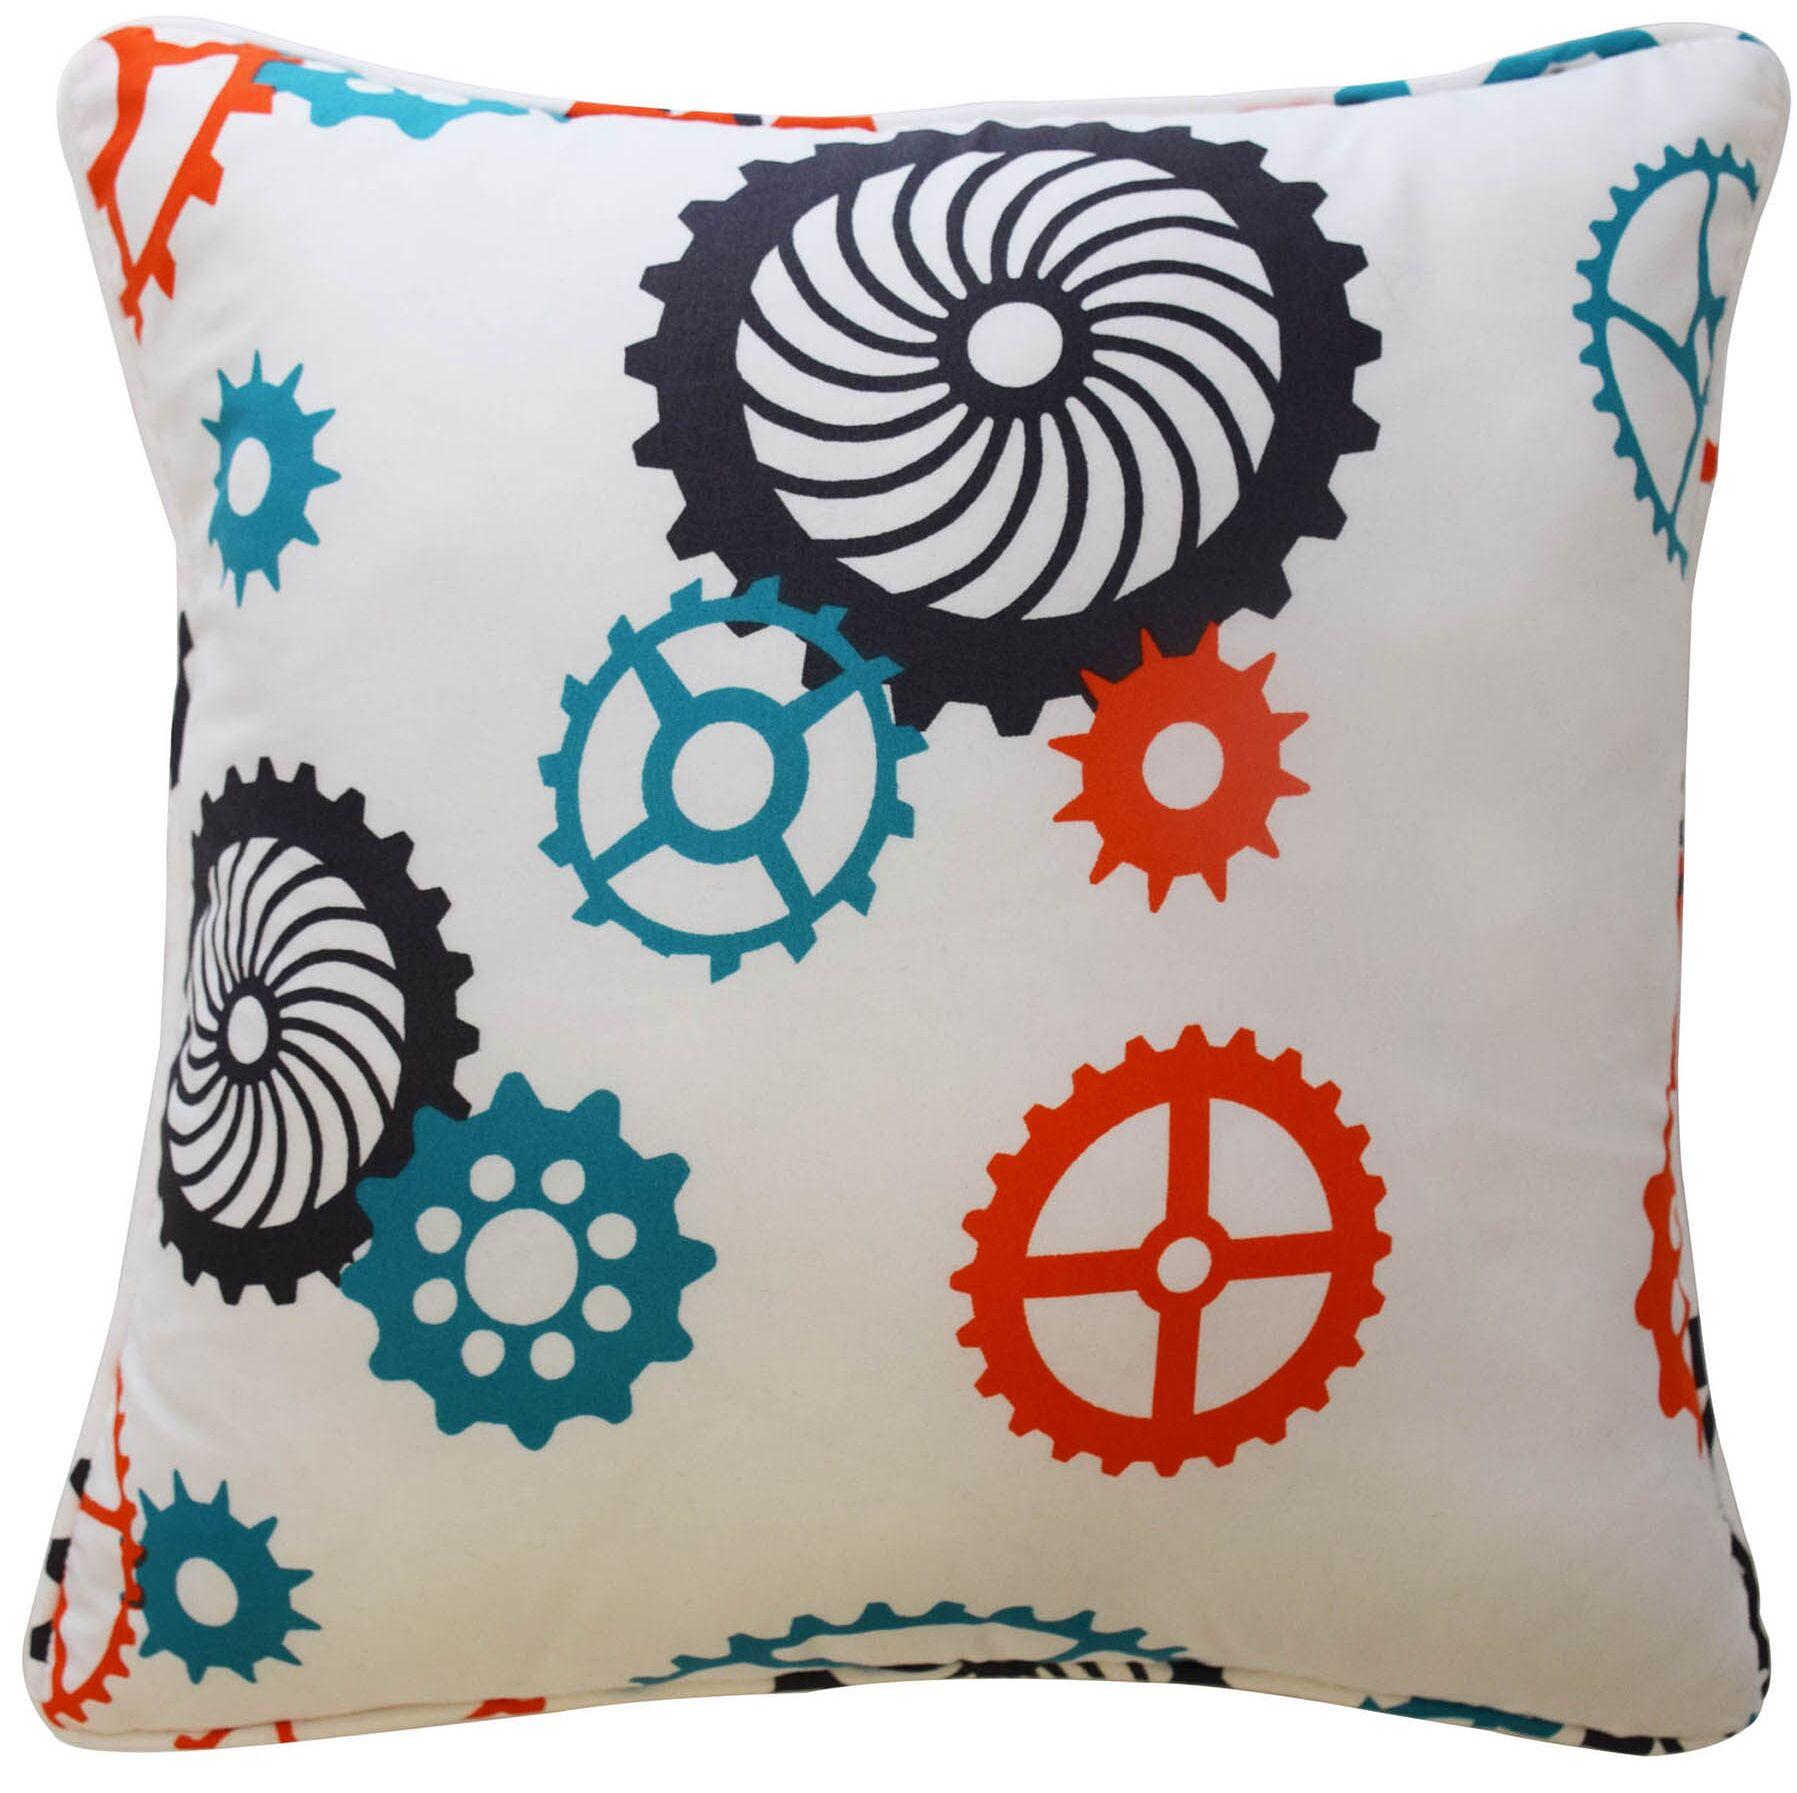 Robotic Polyester Throw Pillow